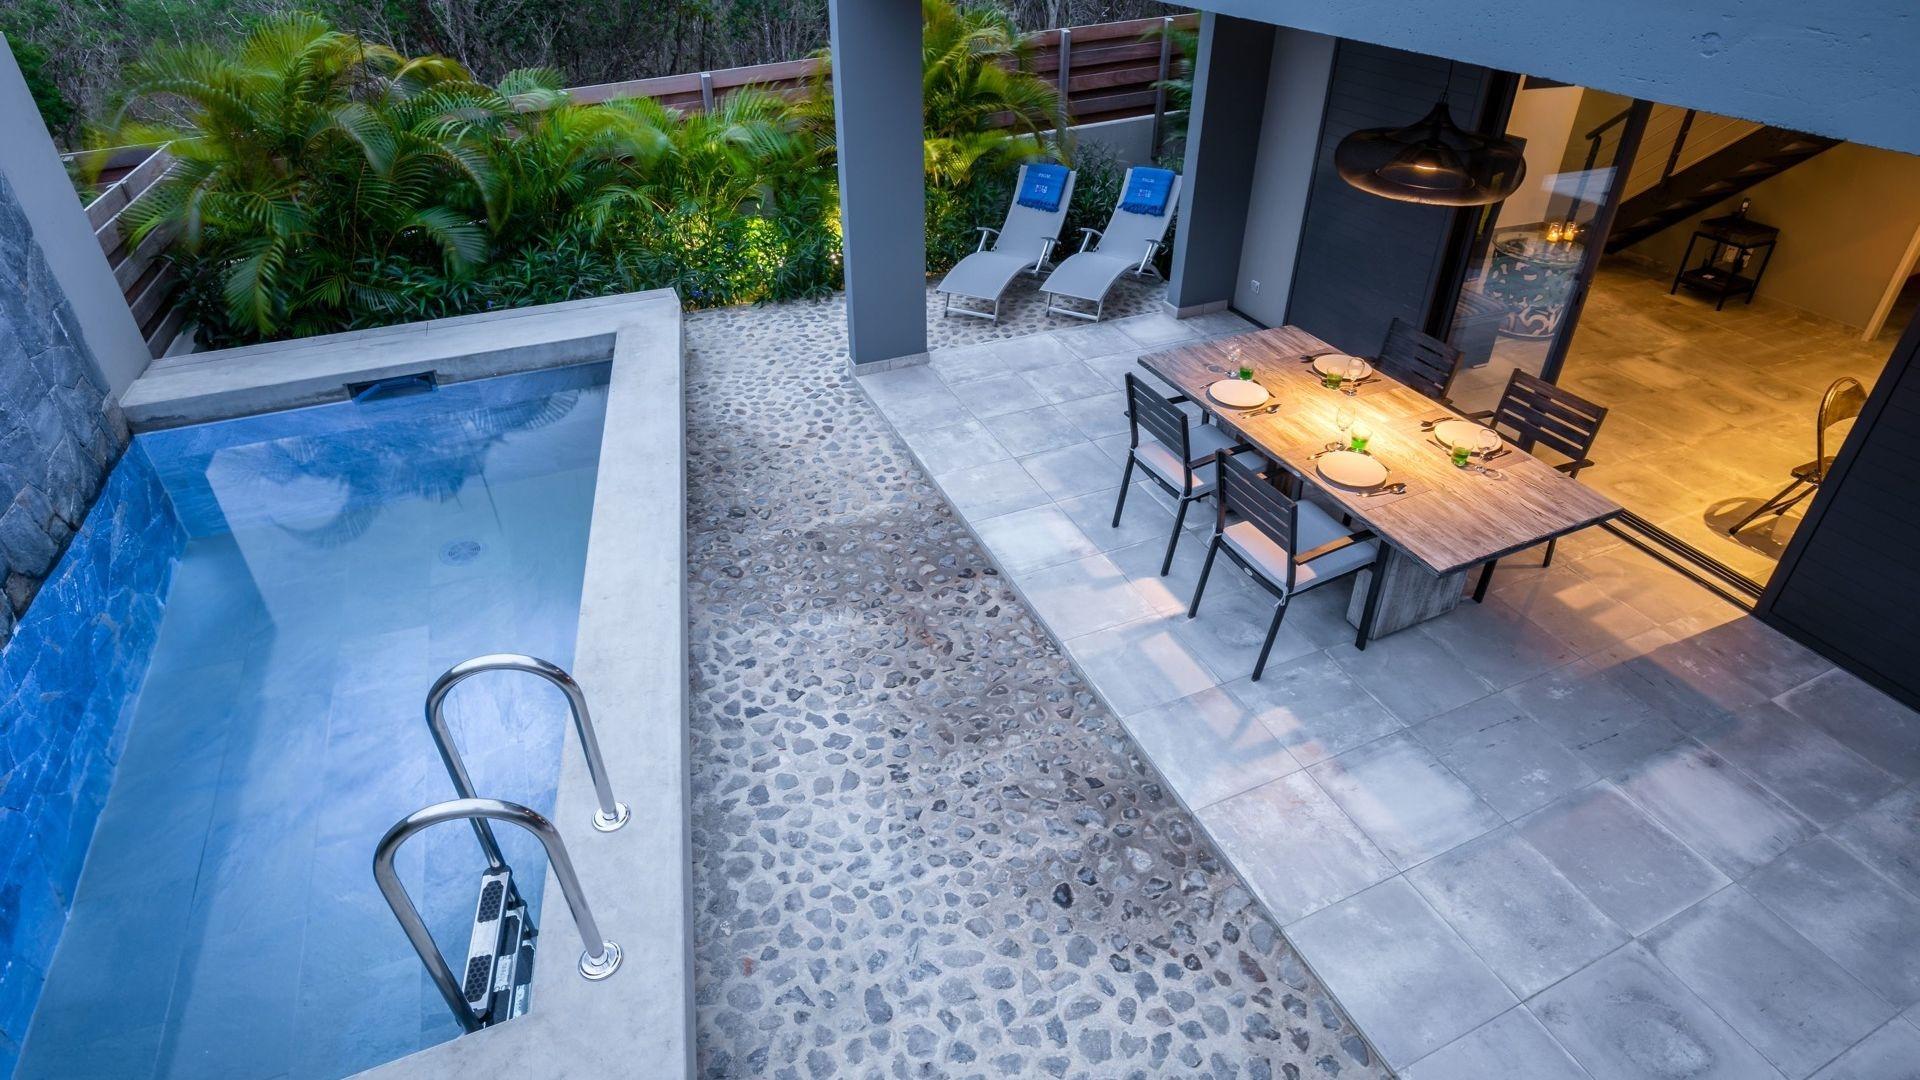 Luxury villa rentals caribbean - St barthelemy - Lurin - No location 4 - Villa Coco - Image 1/16